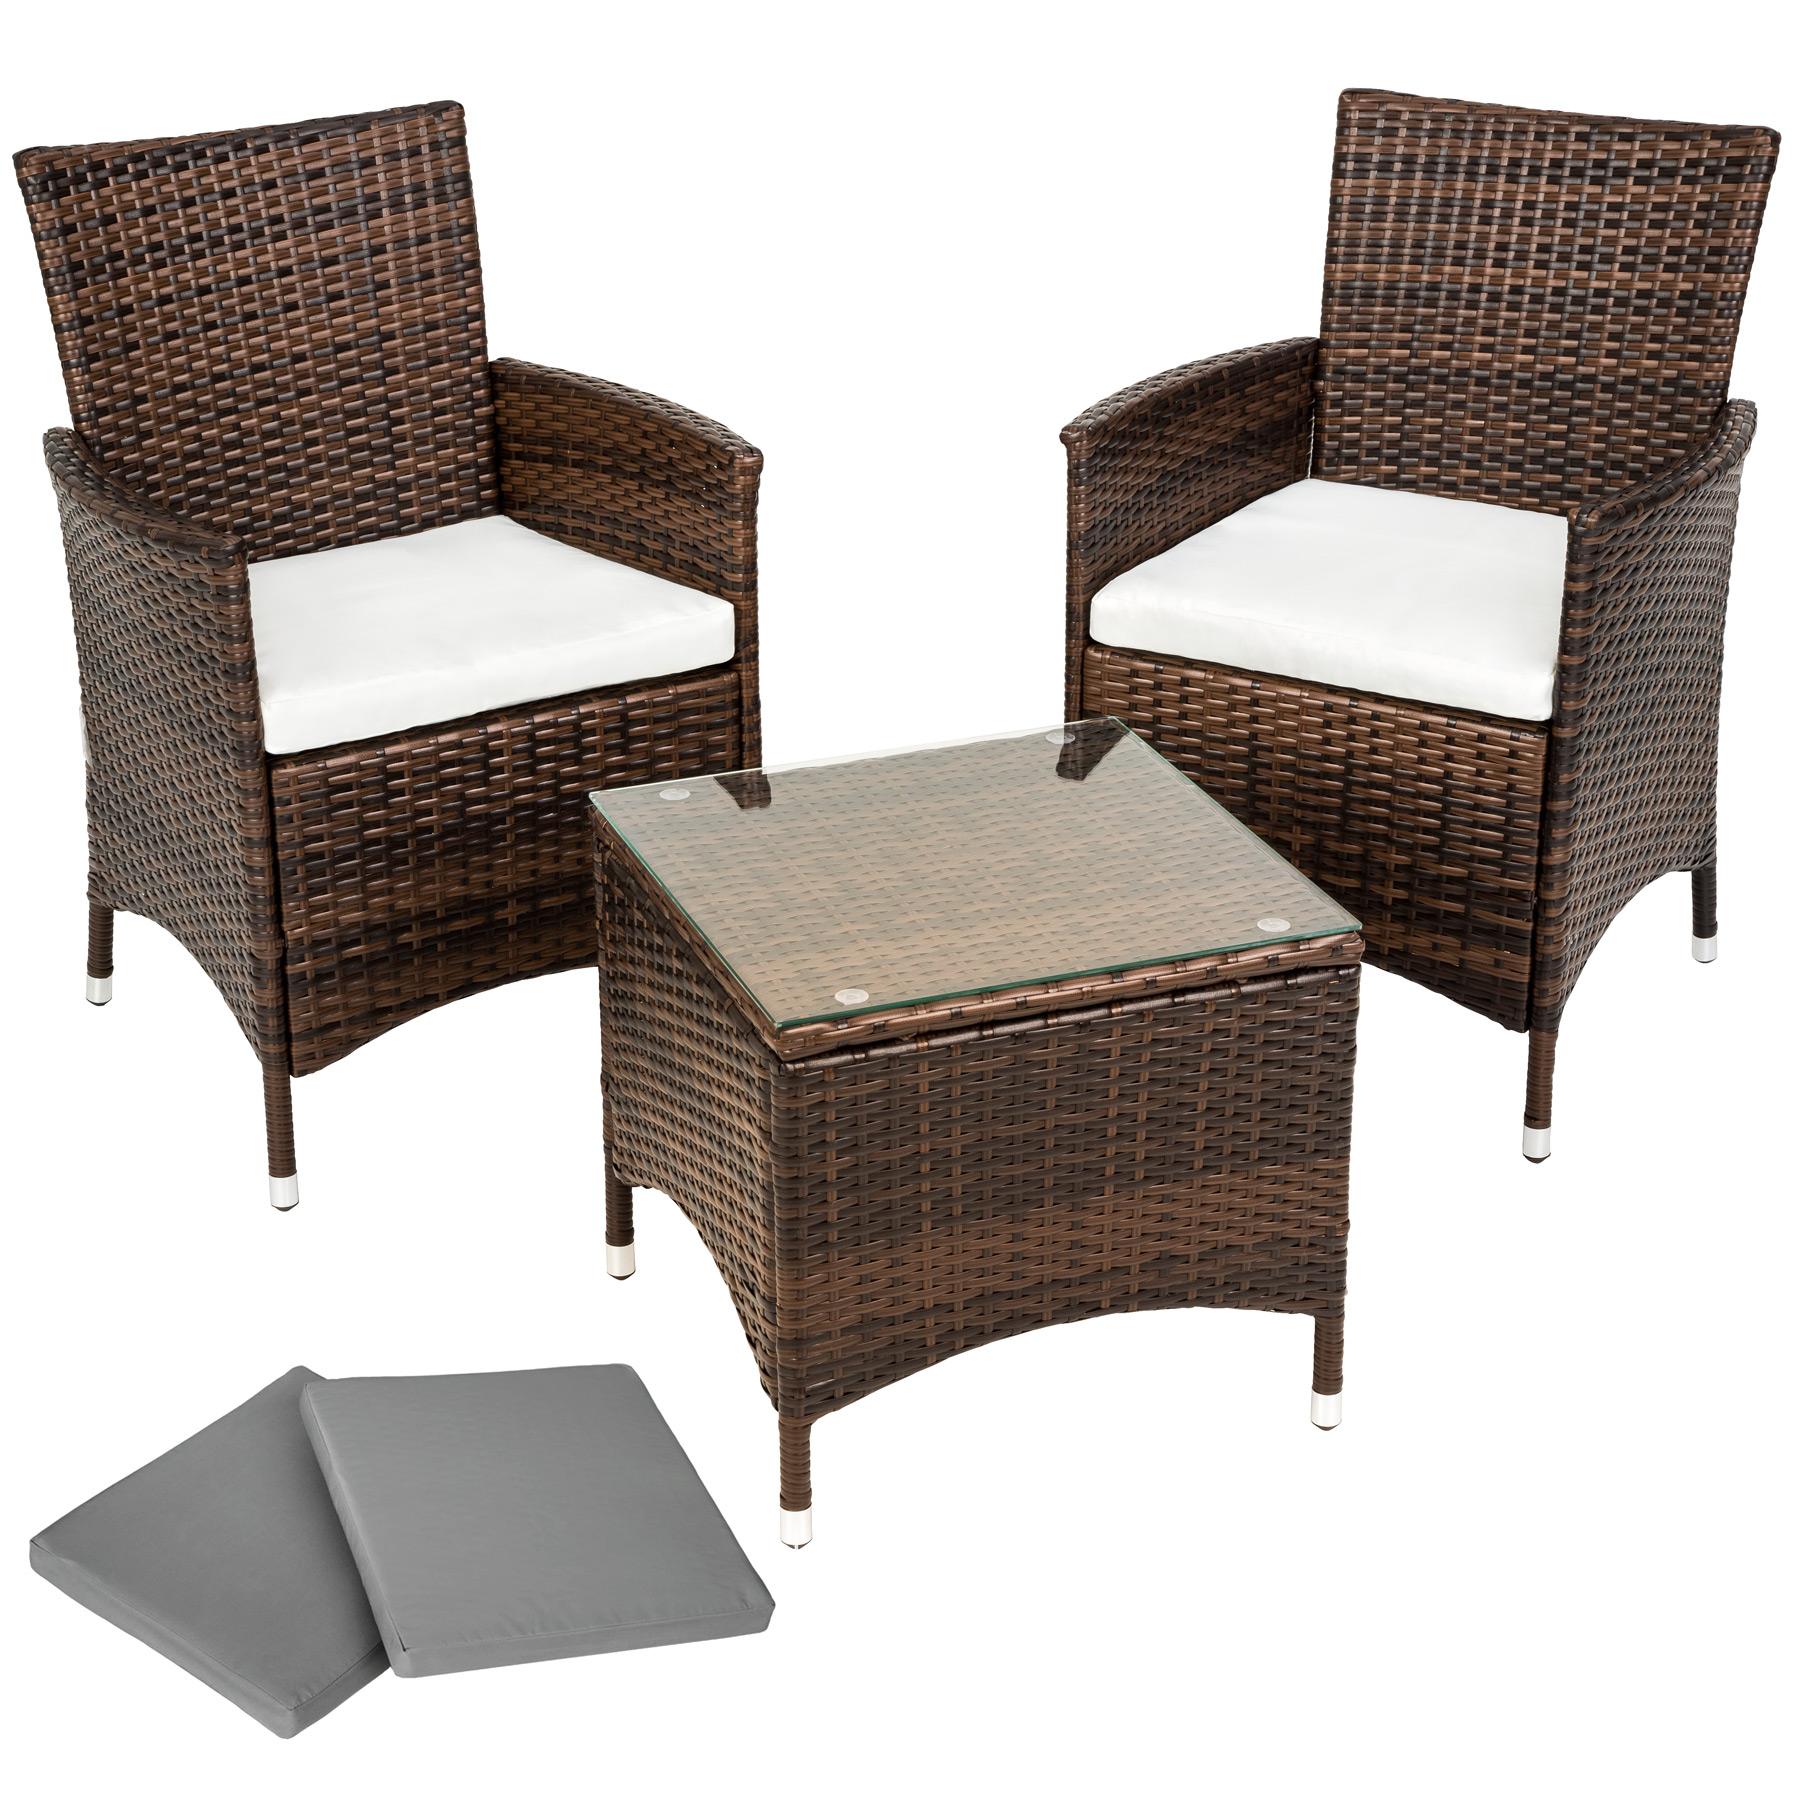 Meble Ogrodowe Tarasowe Krzesla Stol Ratan 401471 7470309004